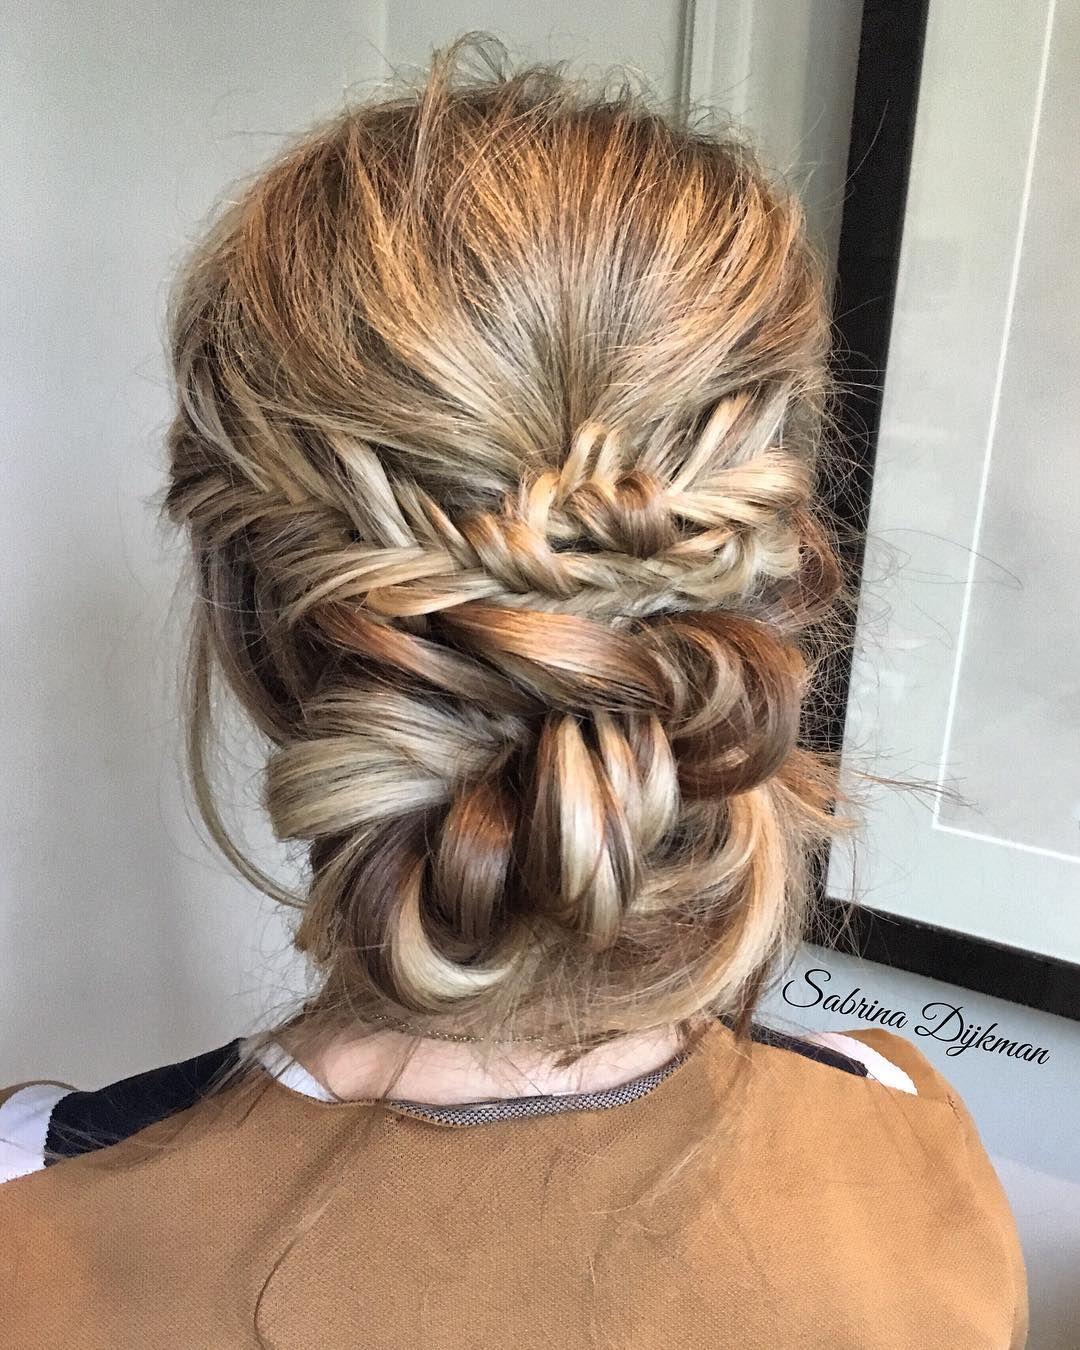 Beautiful Updos Wedding Hairstyle by Sabrina Dijkman